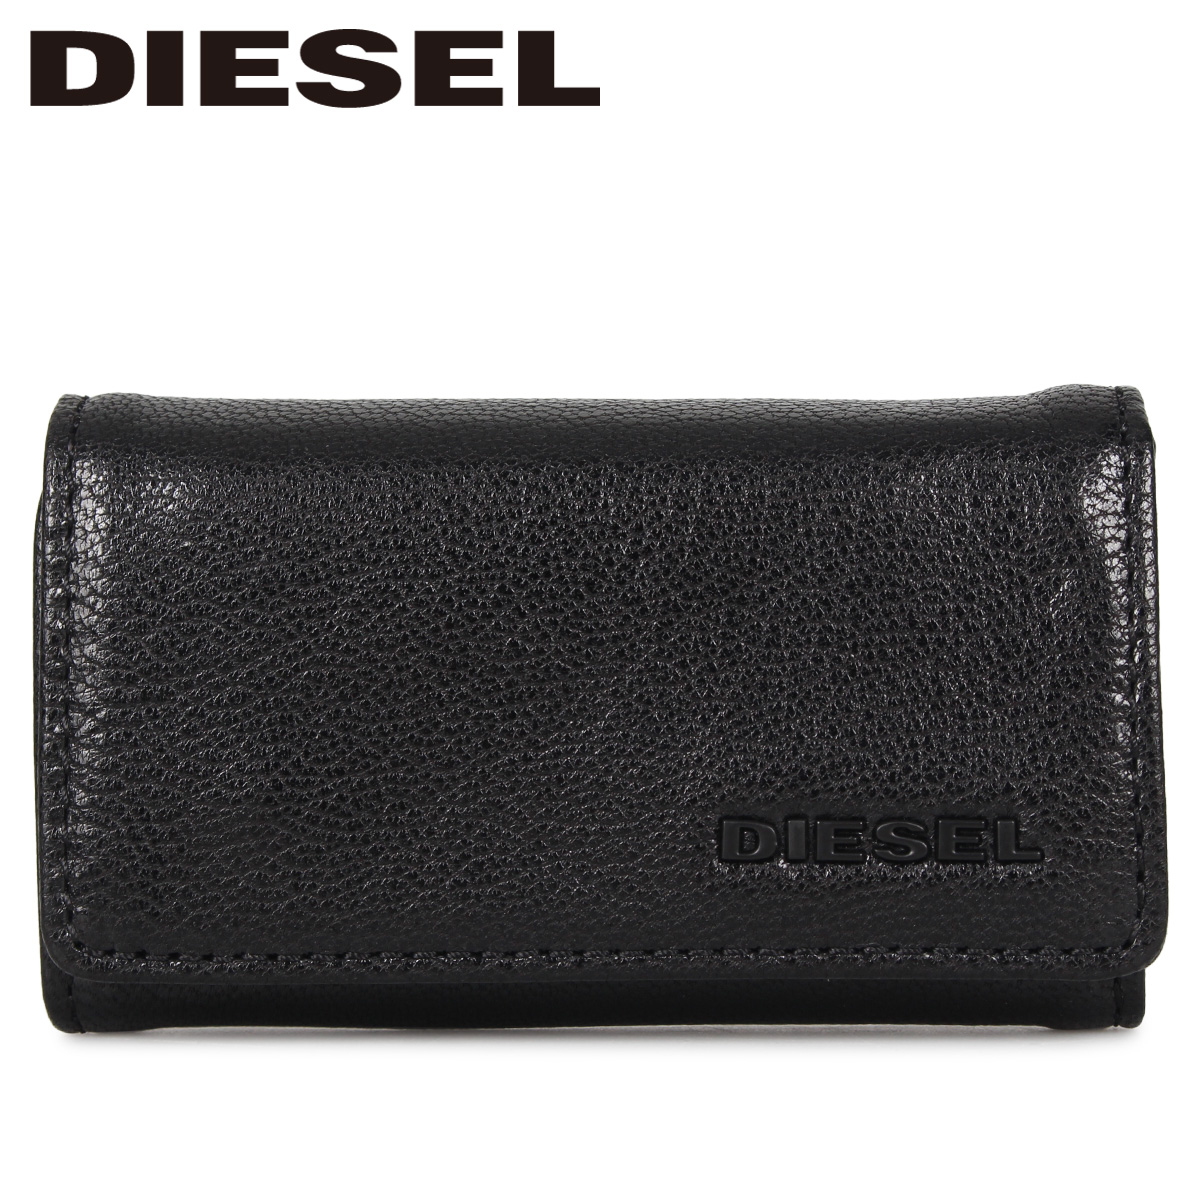 DIESEL ディーゼル キーケース キーホルダー メンズ KEYCASE II ブラック 黒 X06640-P3043